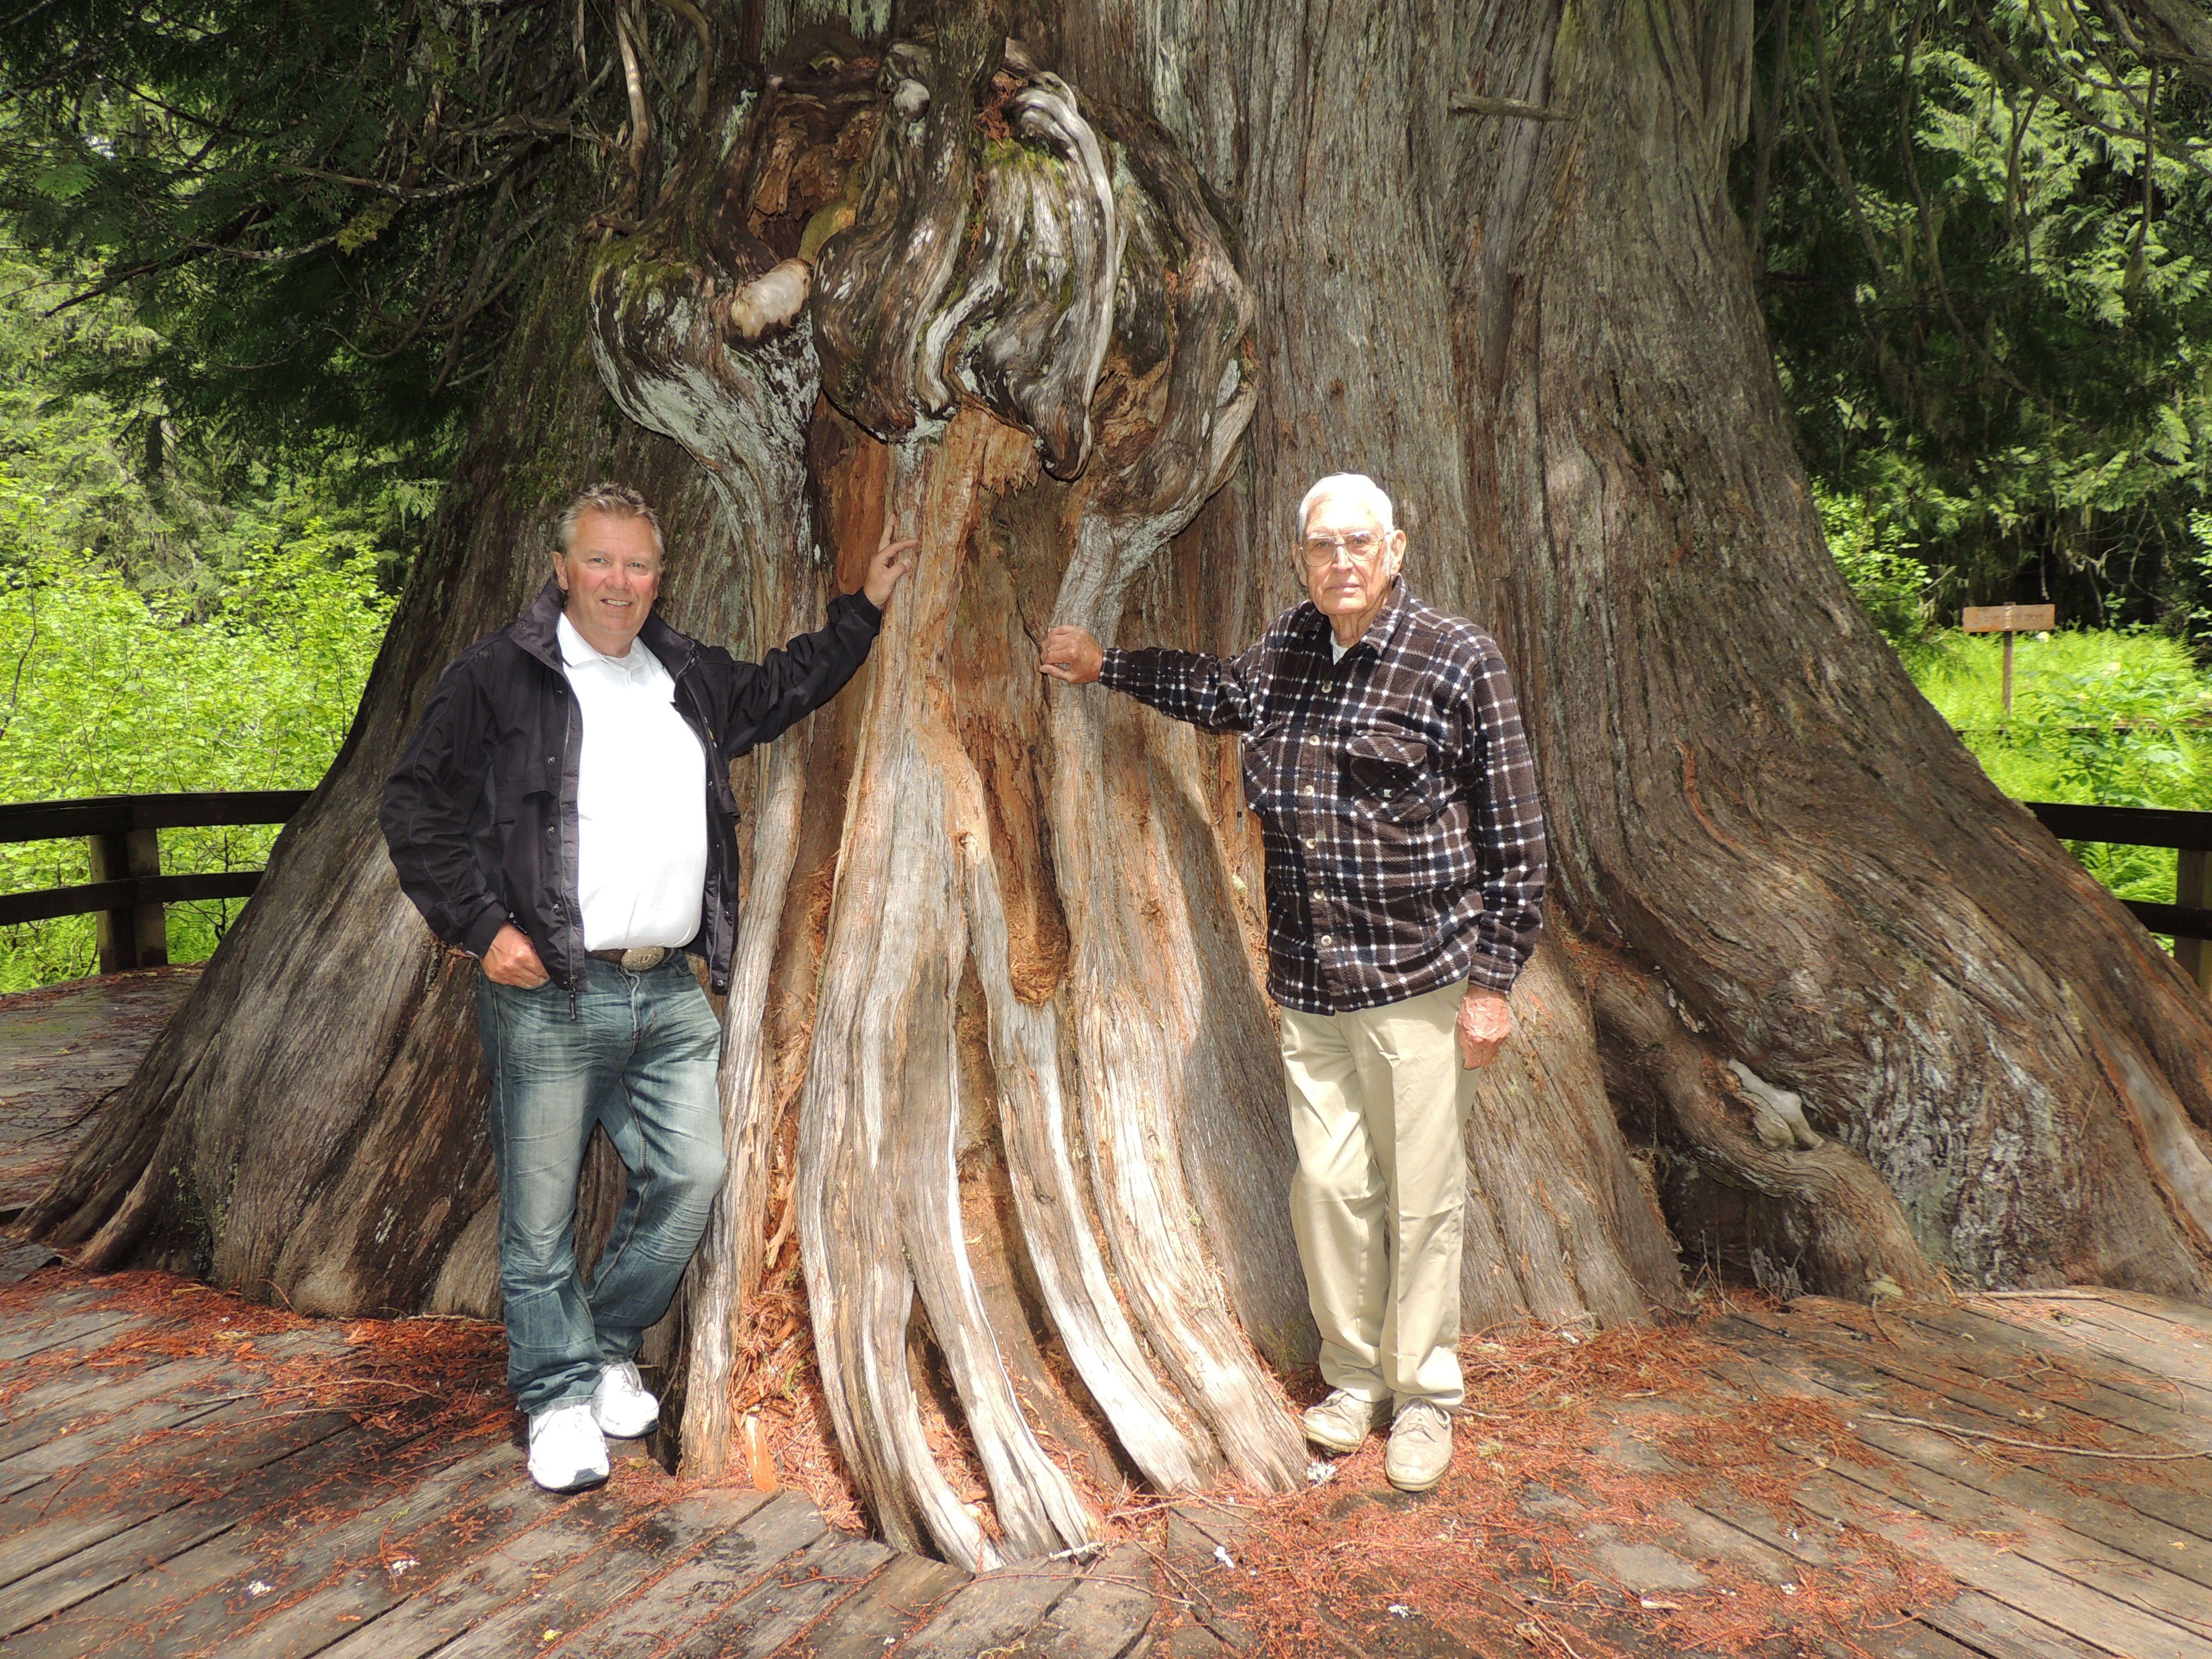 Giant Western Red Cedar Tree, near Elk River, Idaho